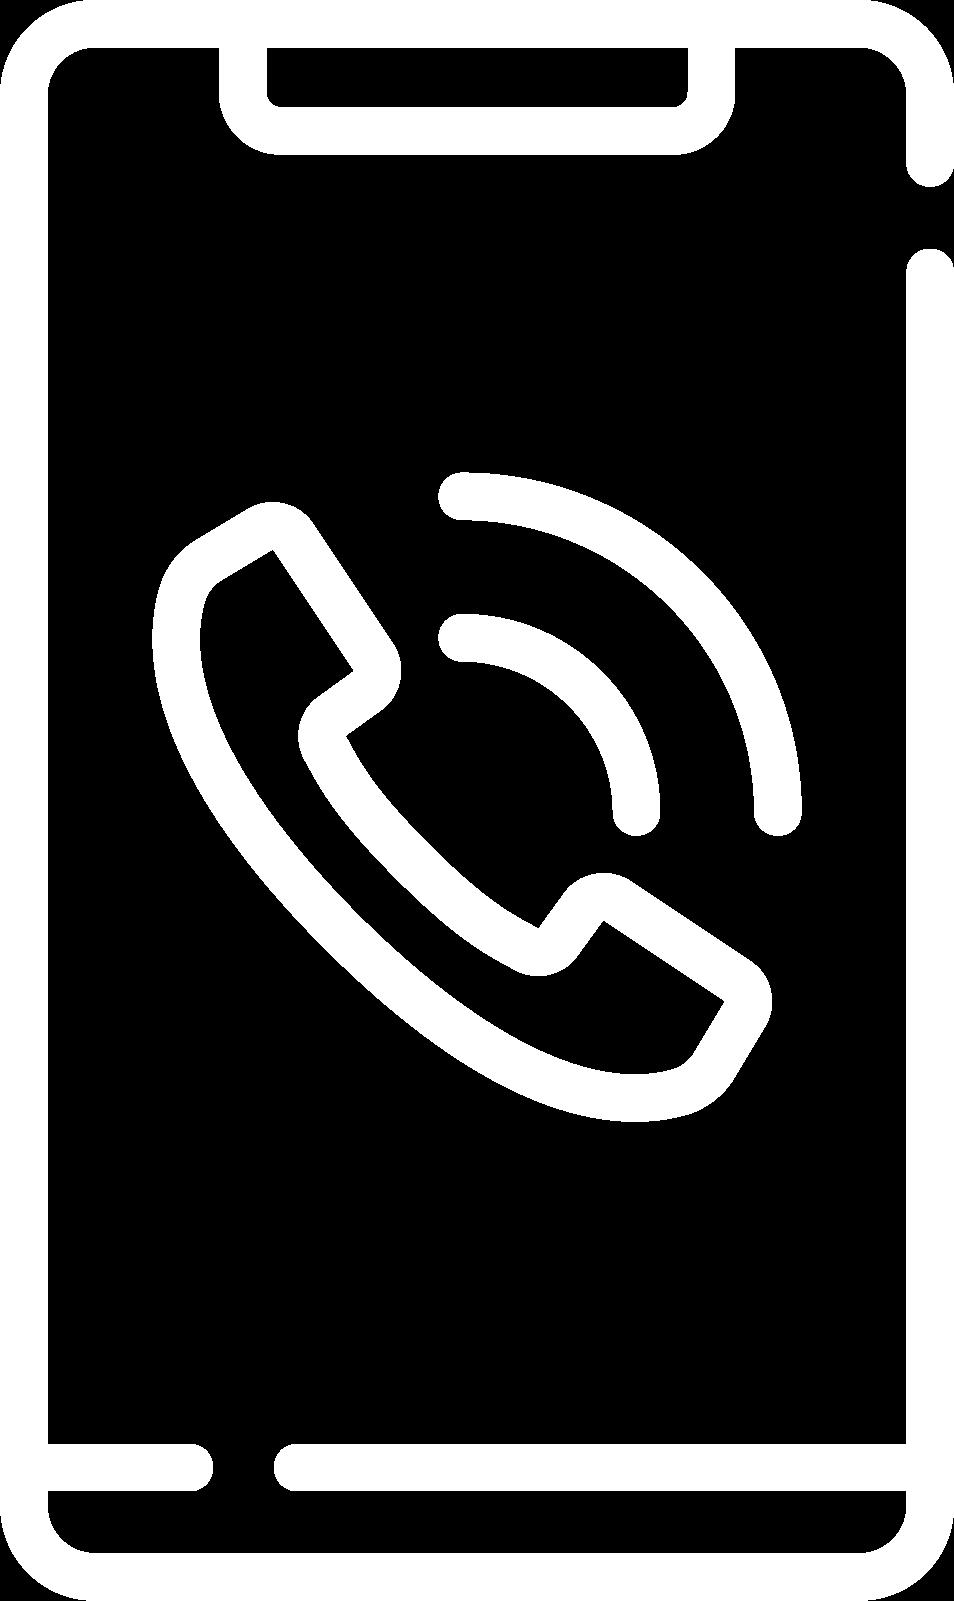 003-phone-call